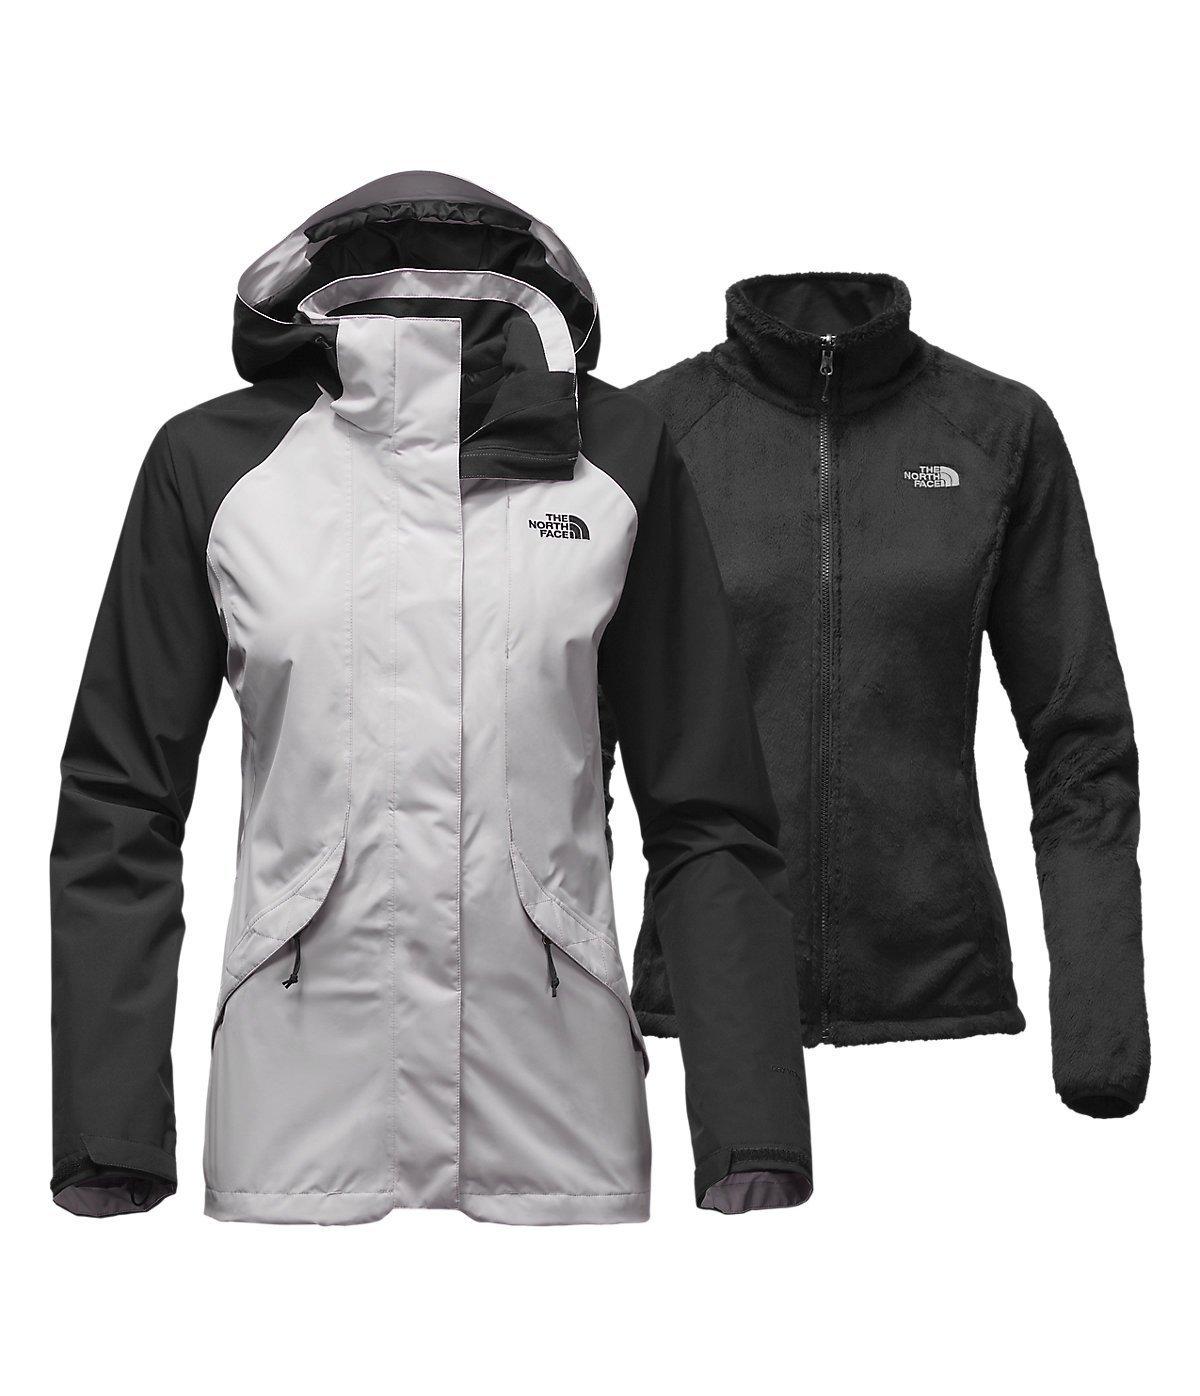 North Face Womens Boundary Triclimate Jacket Large Lunar Ice Grey/TNF Black [並行輸入品] B075CJJ8Z4